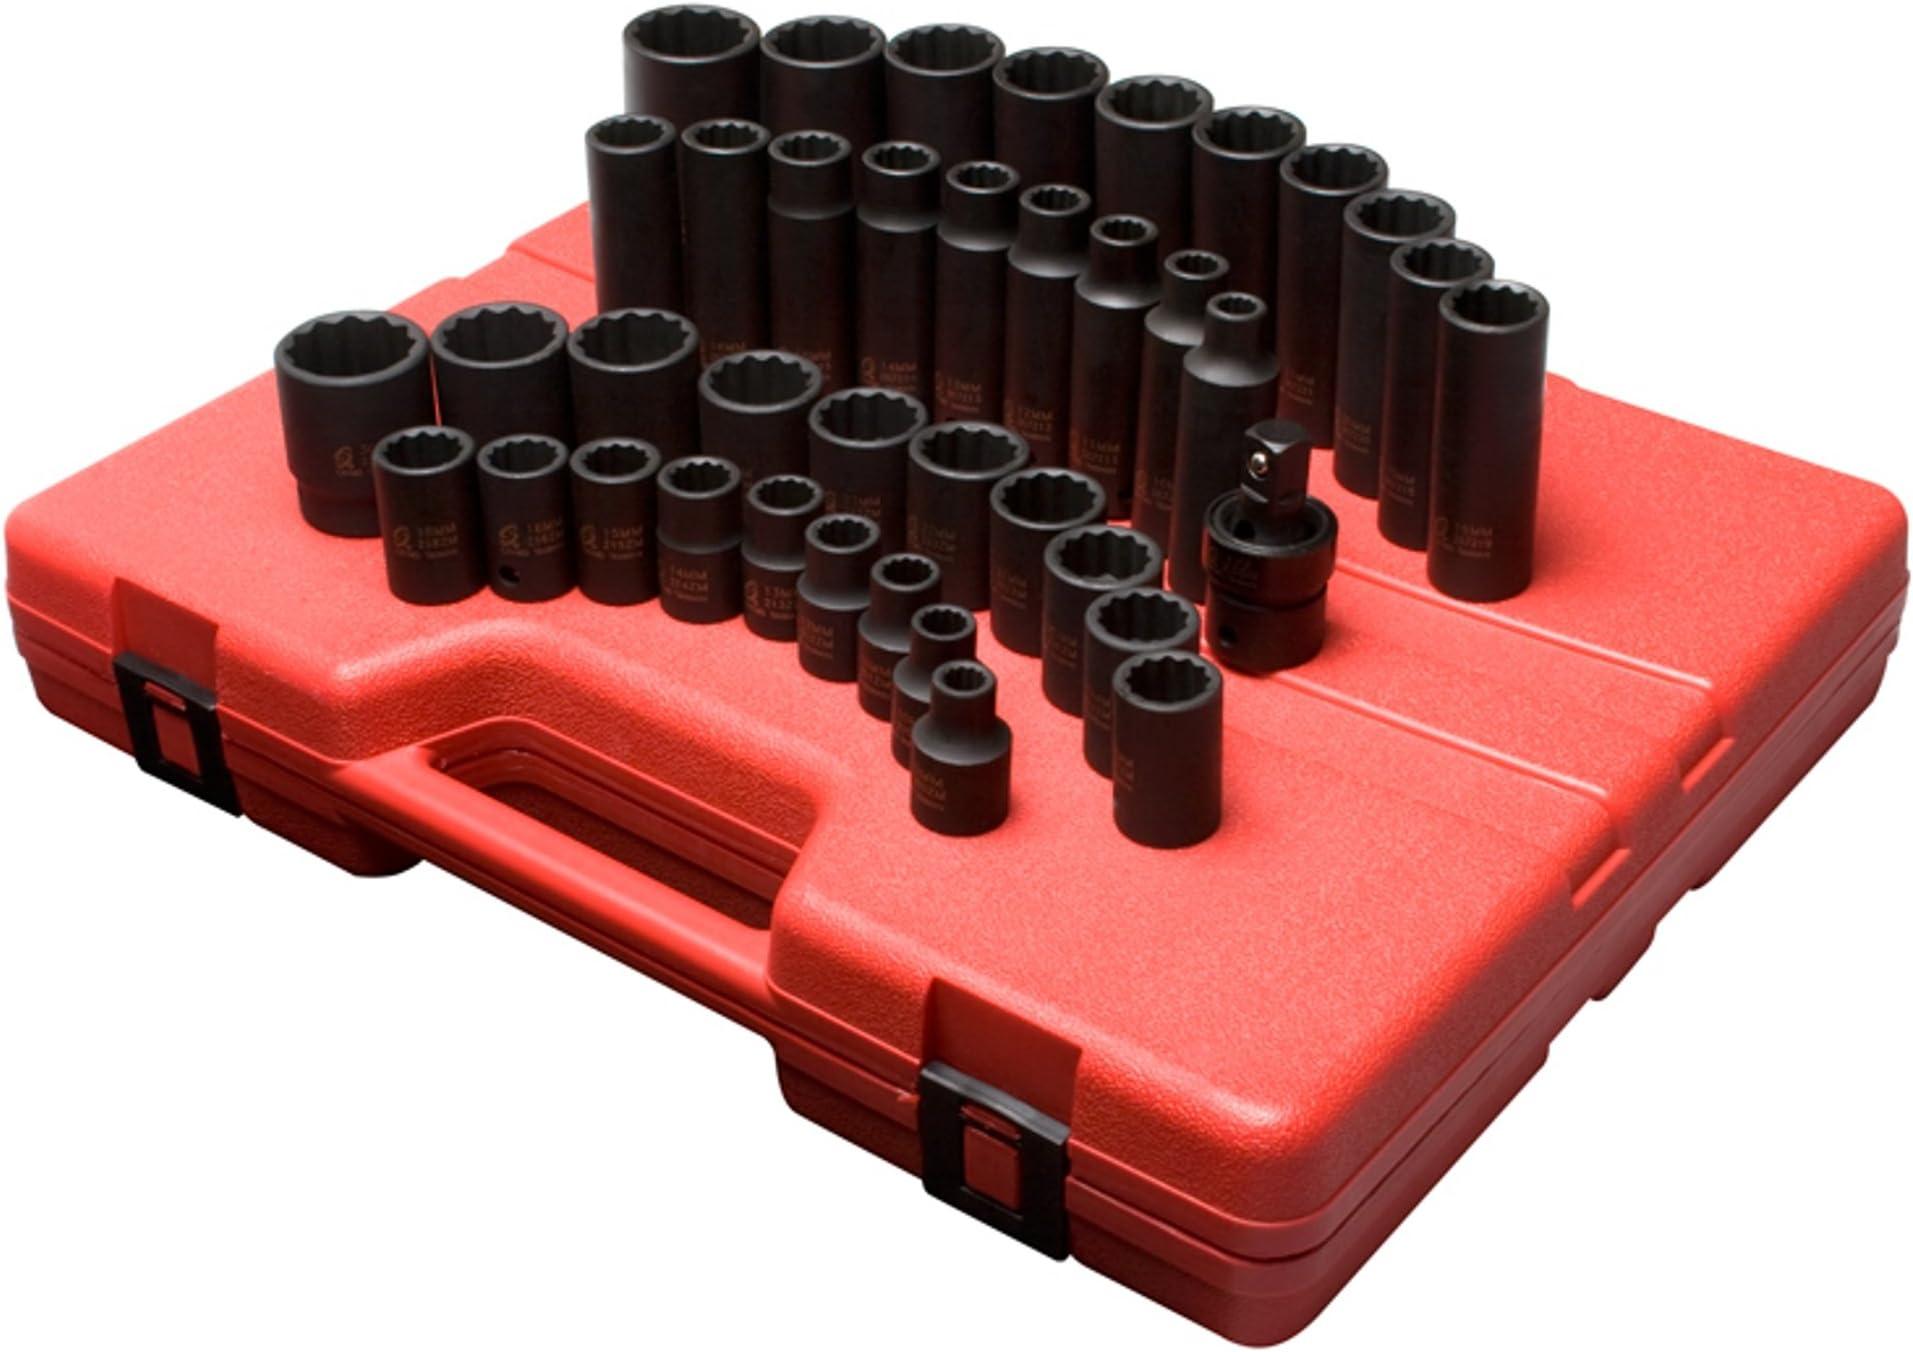 Standard//Deep TUZkozs 9mm Universal Joint /& Impact Extensions Heavy Duty Storage Case Cr-Mo Alloy Steel 30mm 1//2 Drive Master Impact Socket Set Radius Corner Design 43Piece Metric